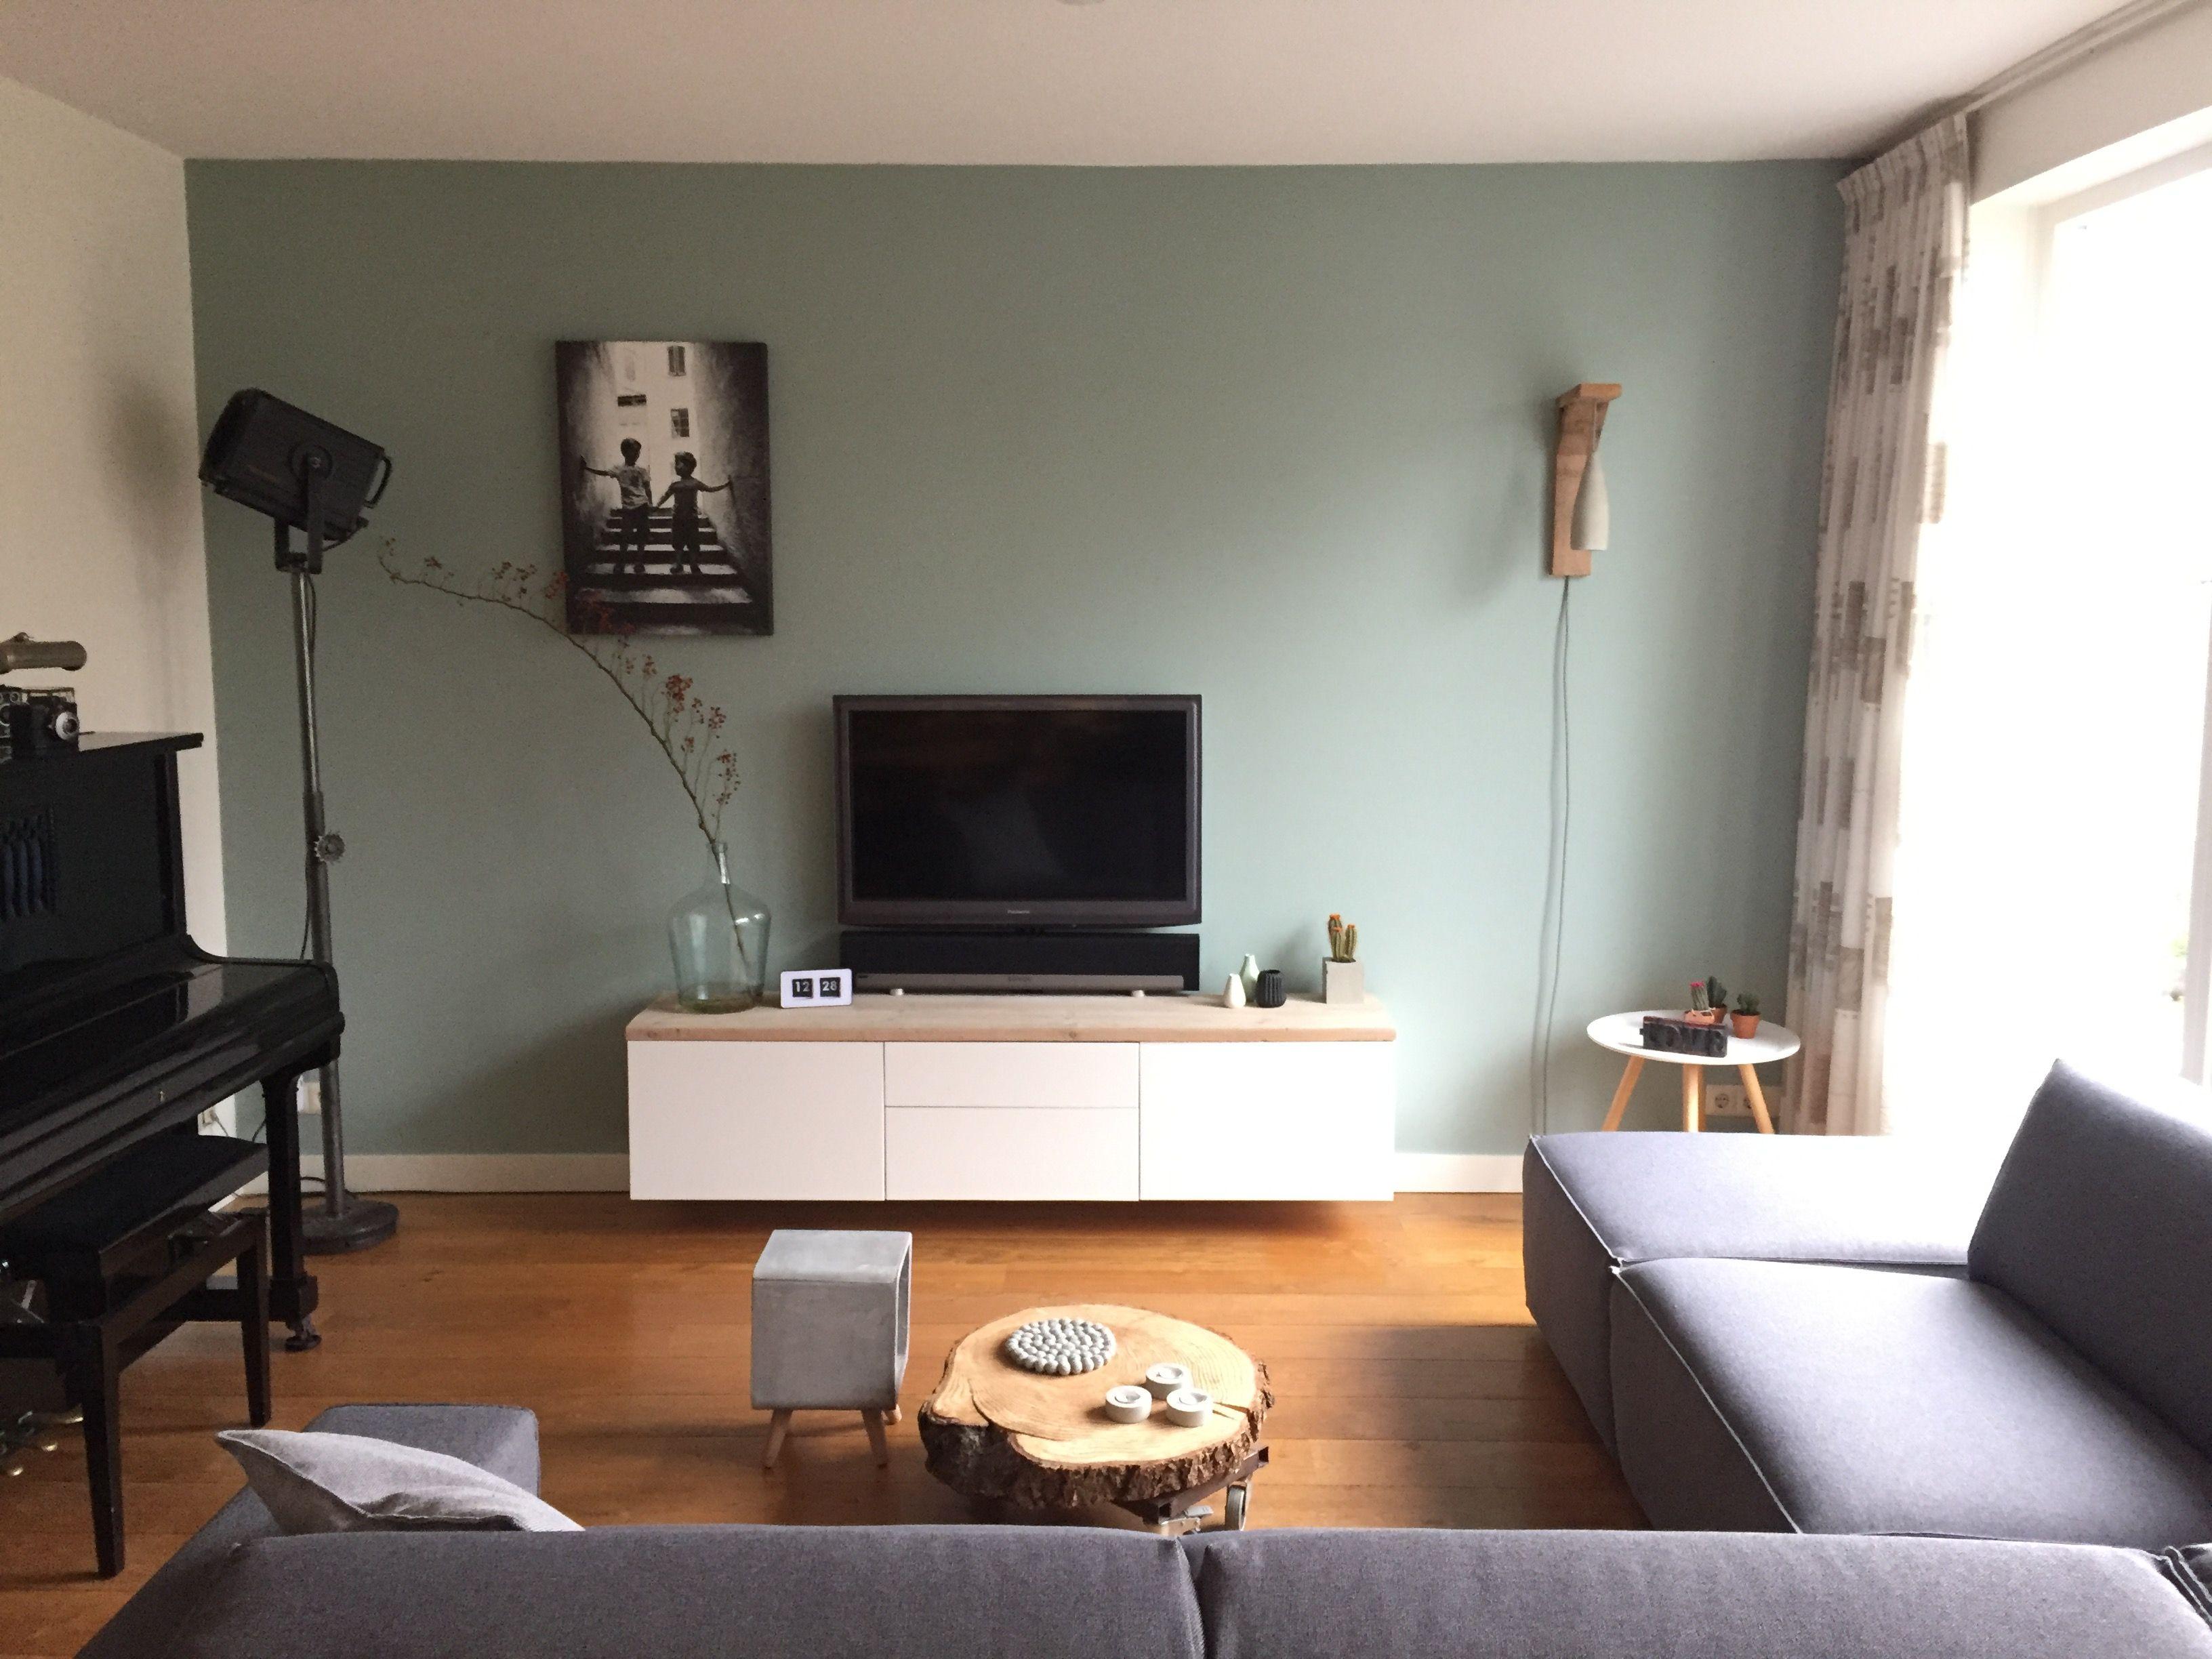 muurverf early dew - Google zoeken | furniture | Pinterest | Living ...